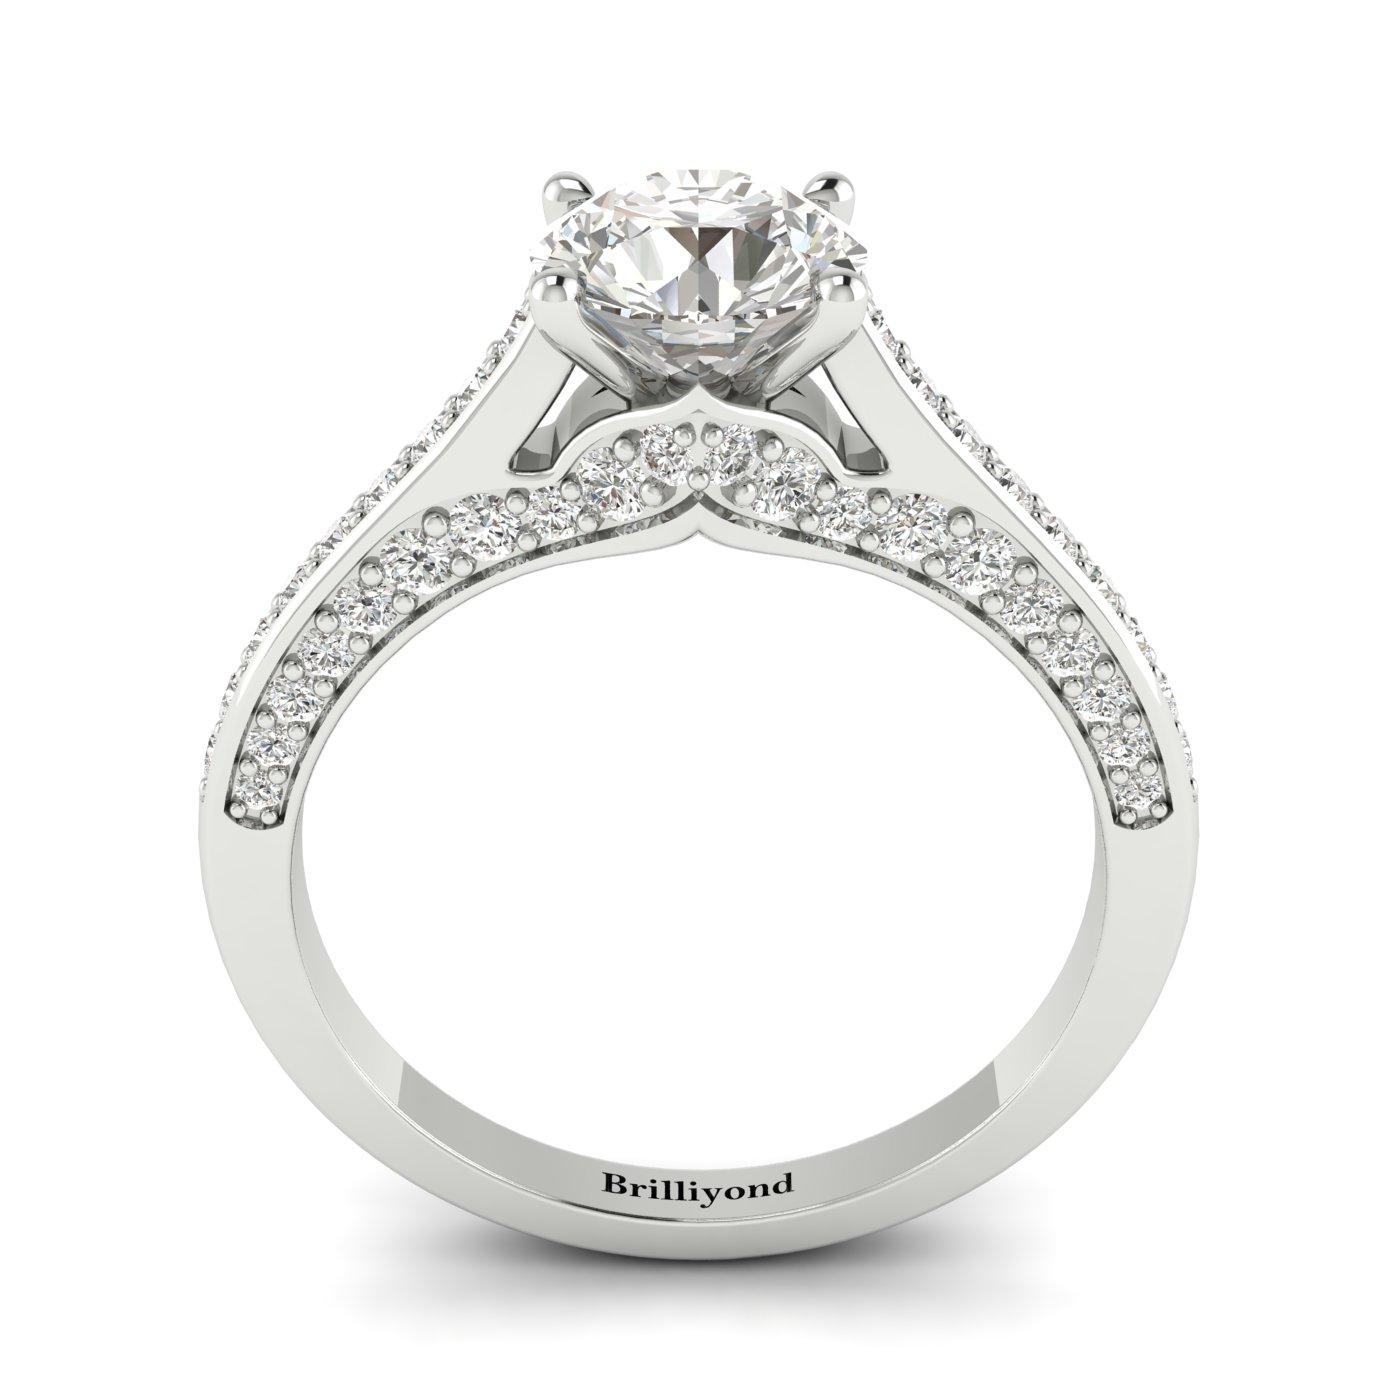 White Sapphire White Gold Brilliant Cut Engagement Ring Stargate_image2